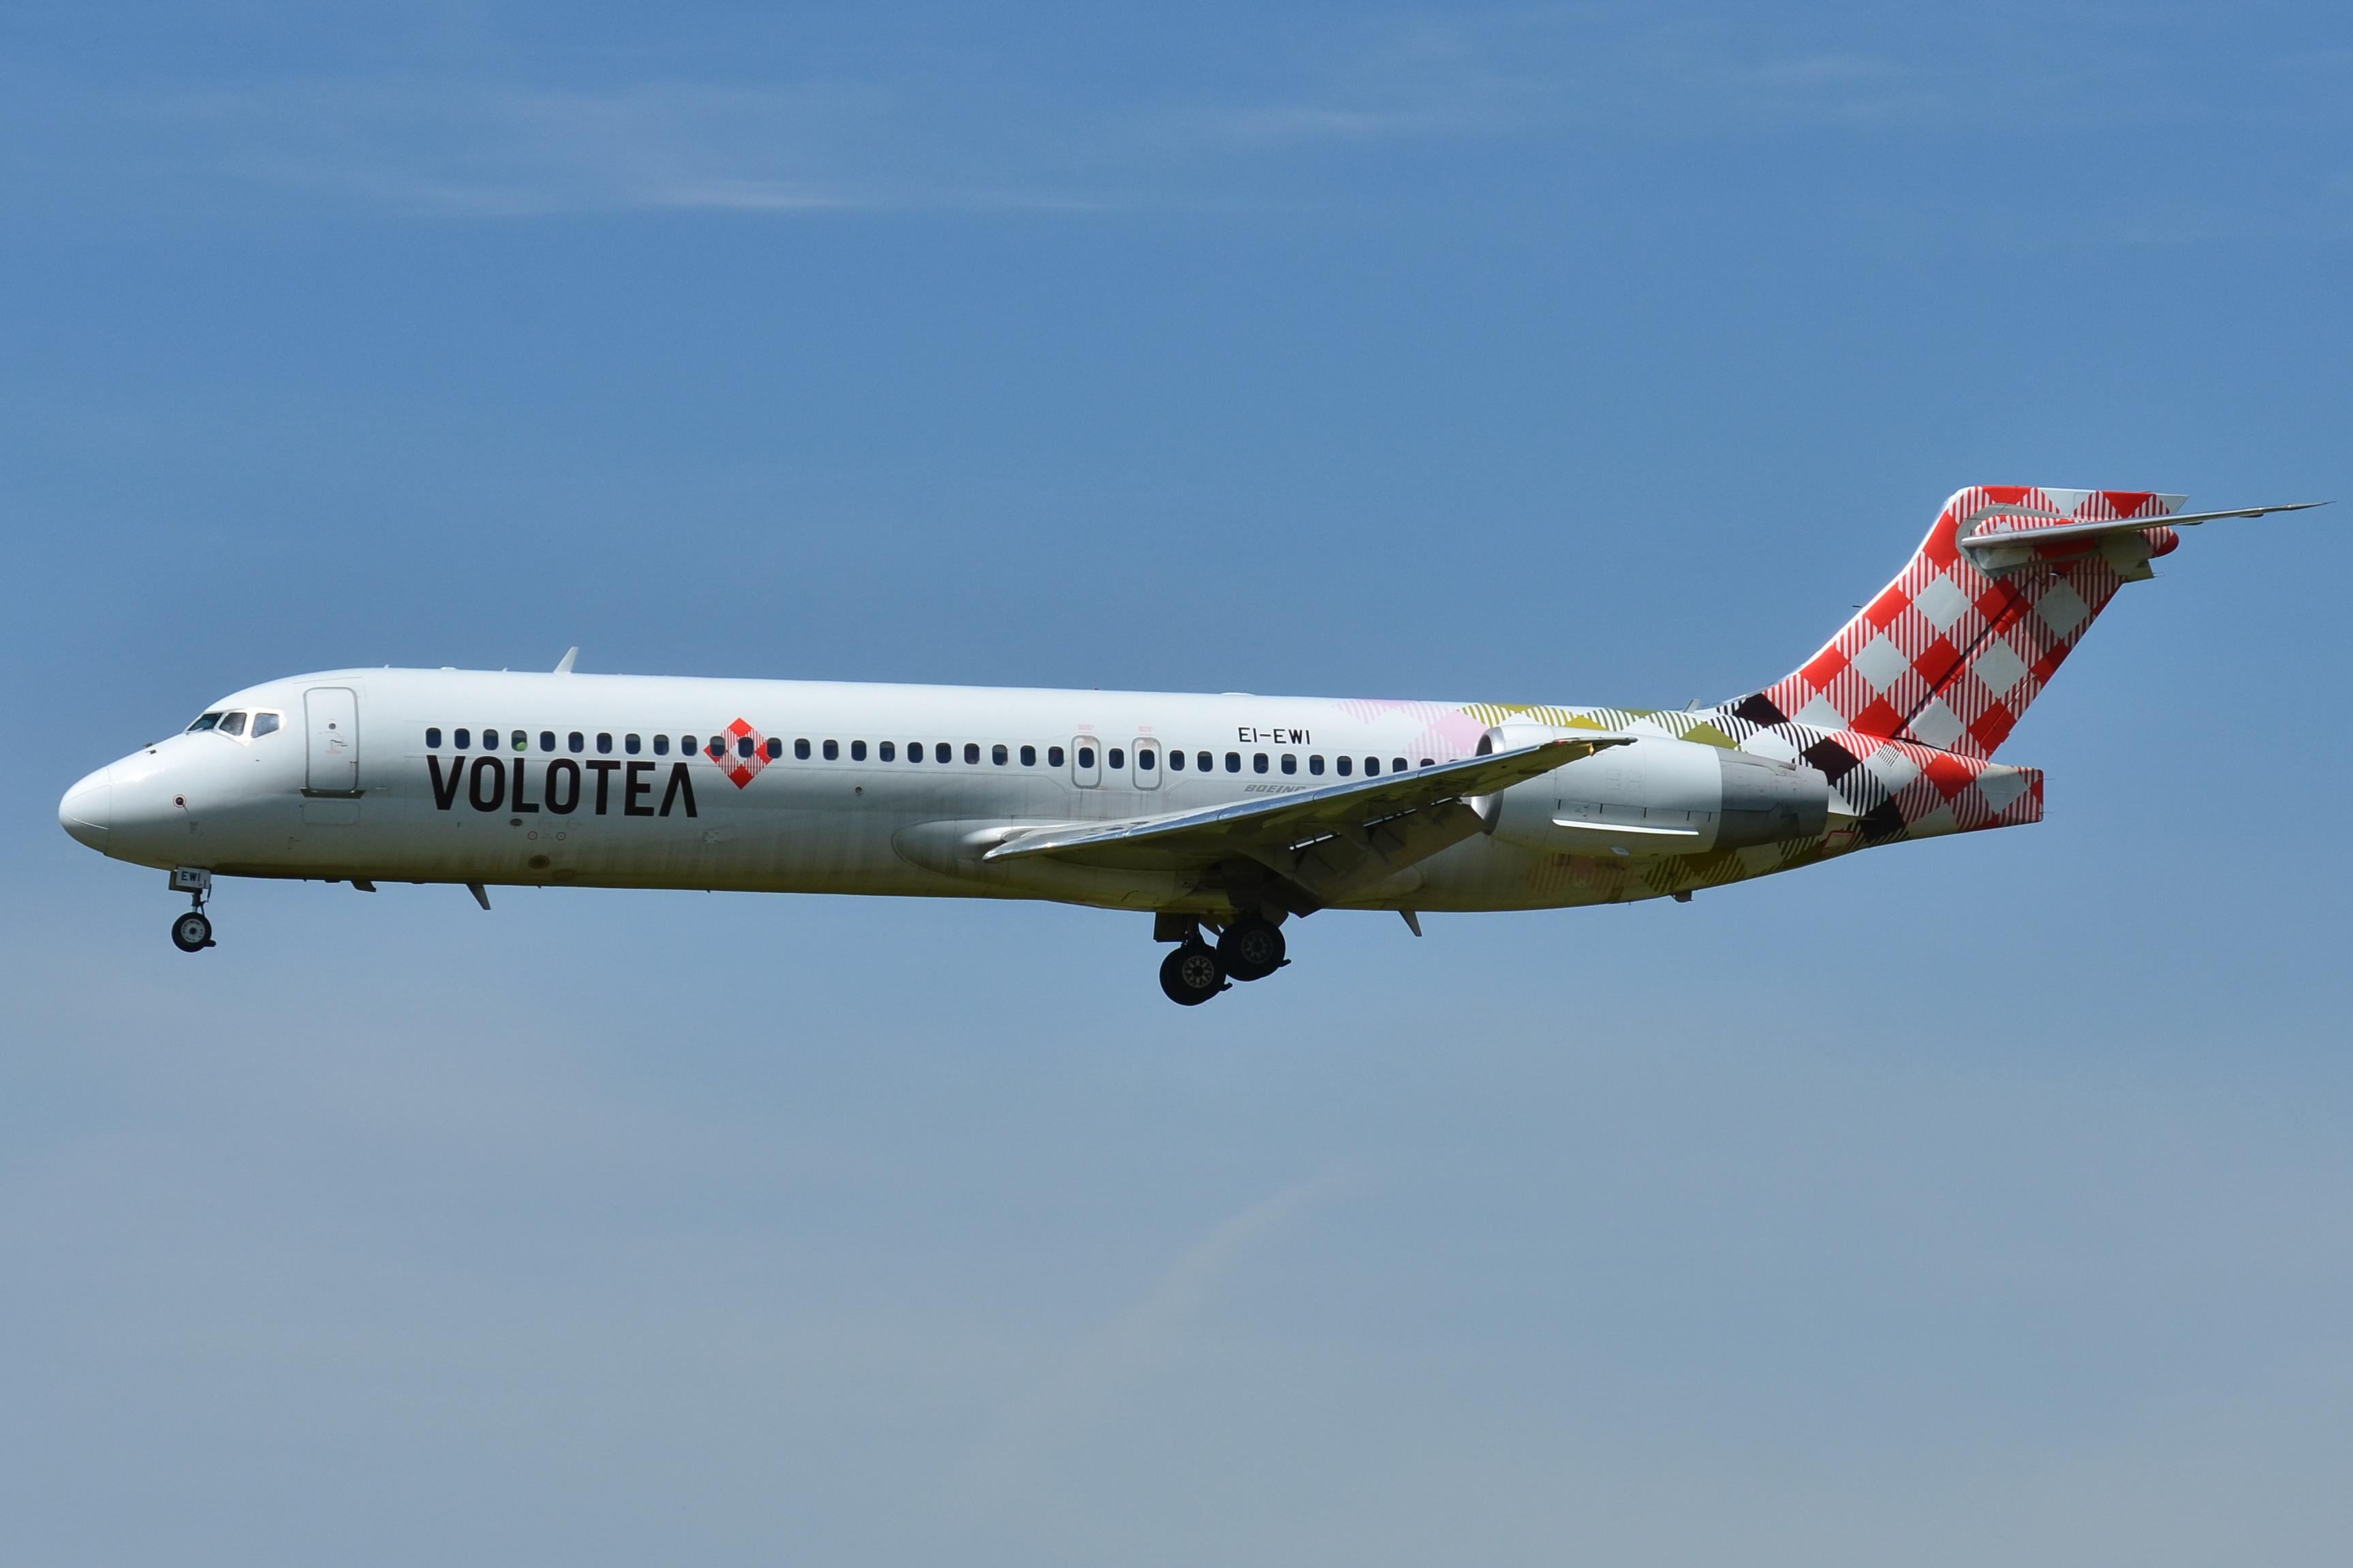 Boeing_717-200_Volotea_Airlines_(VOE)_EI-EWI_-_MSN_55170_5120_(9649079814)